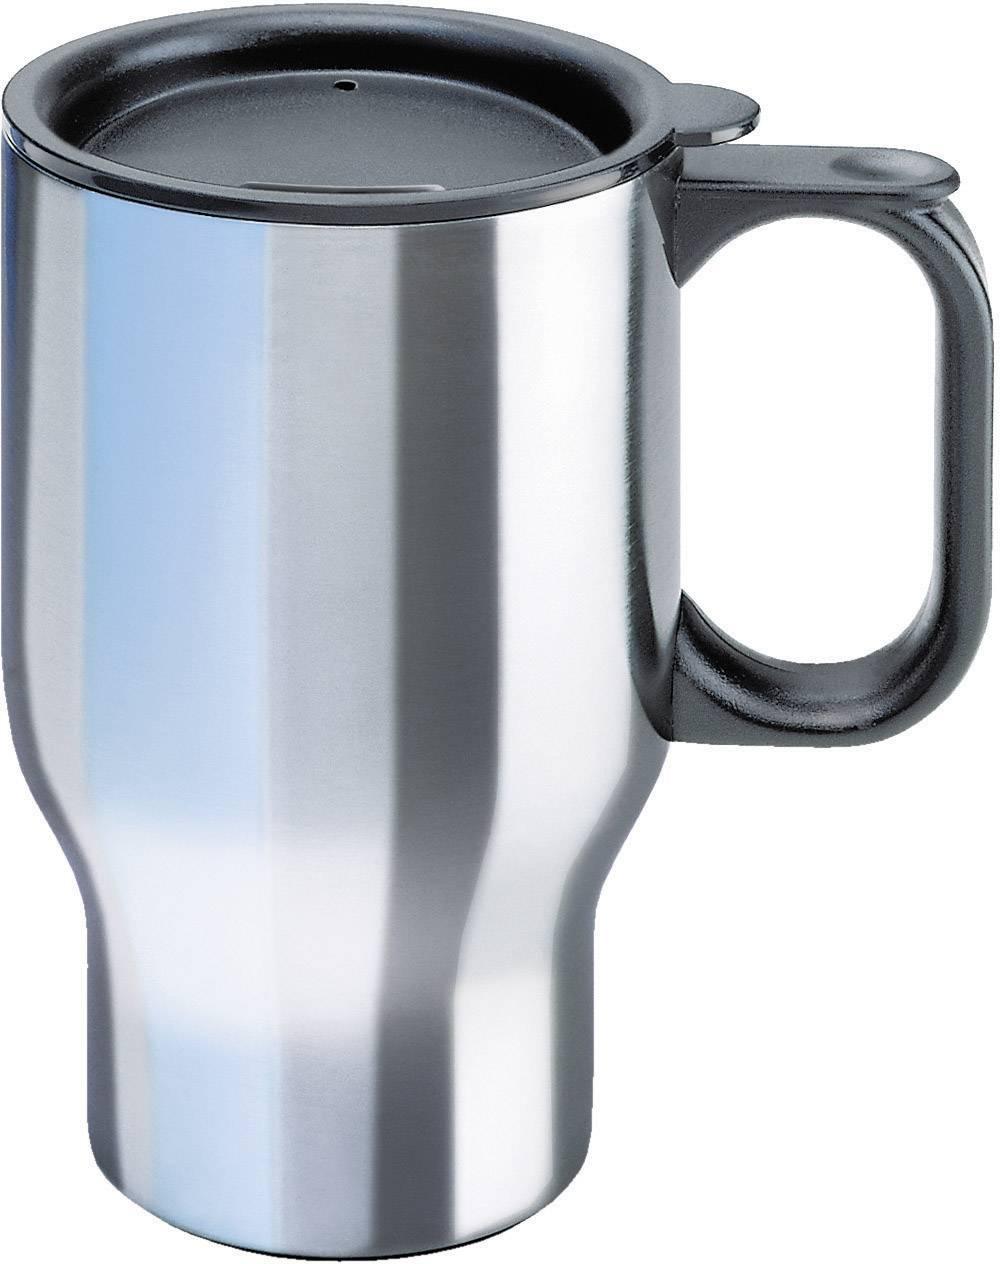 Thermo hrnček Isosteel Autobecher 400 ml, nerezová oceľ lesklá, 400 ml, VA-9558